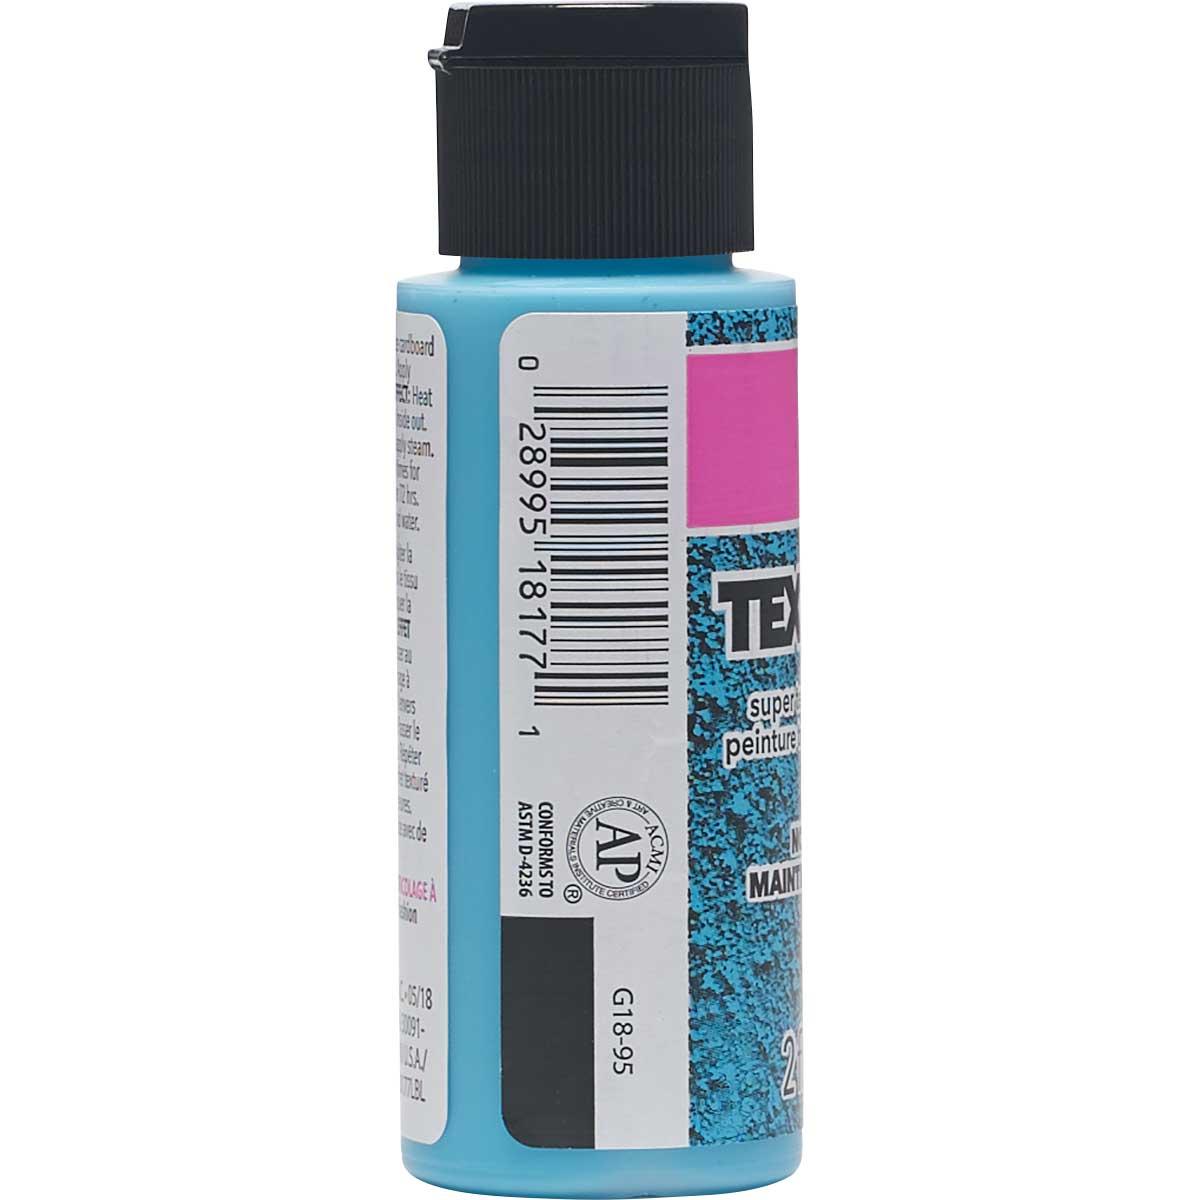 LaurDIY ® Texturific™ Fabric Paint - Now or Never, 2 oz.